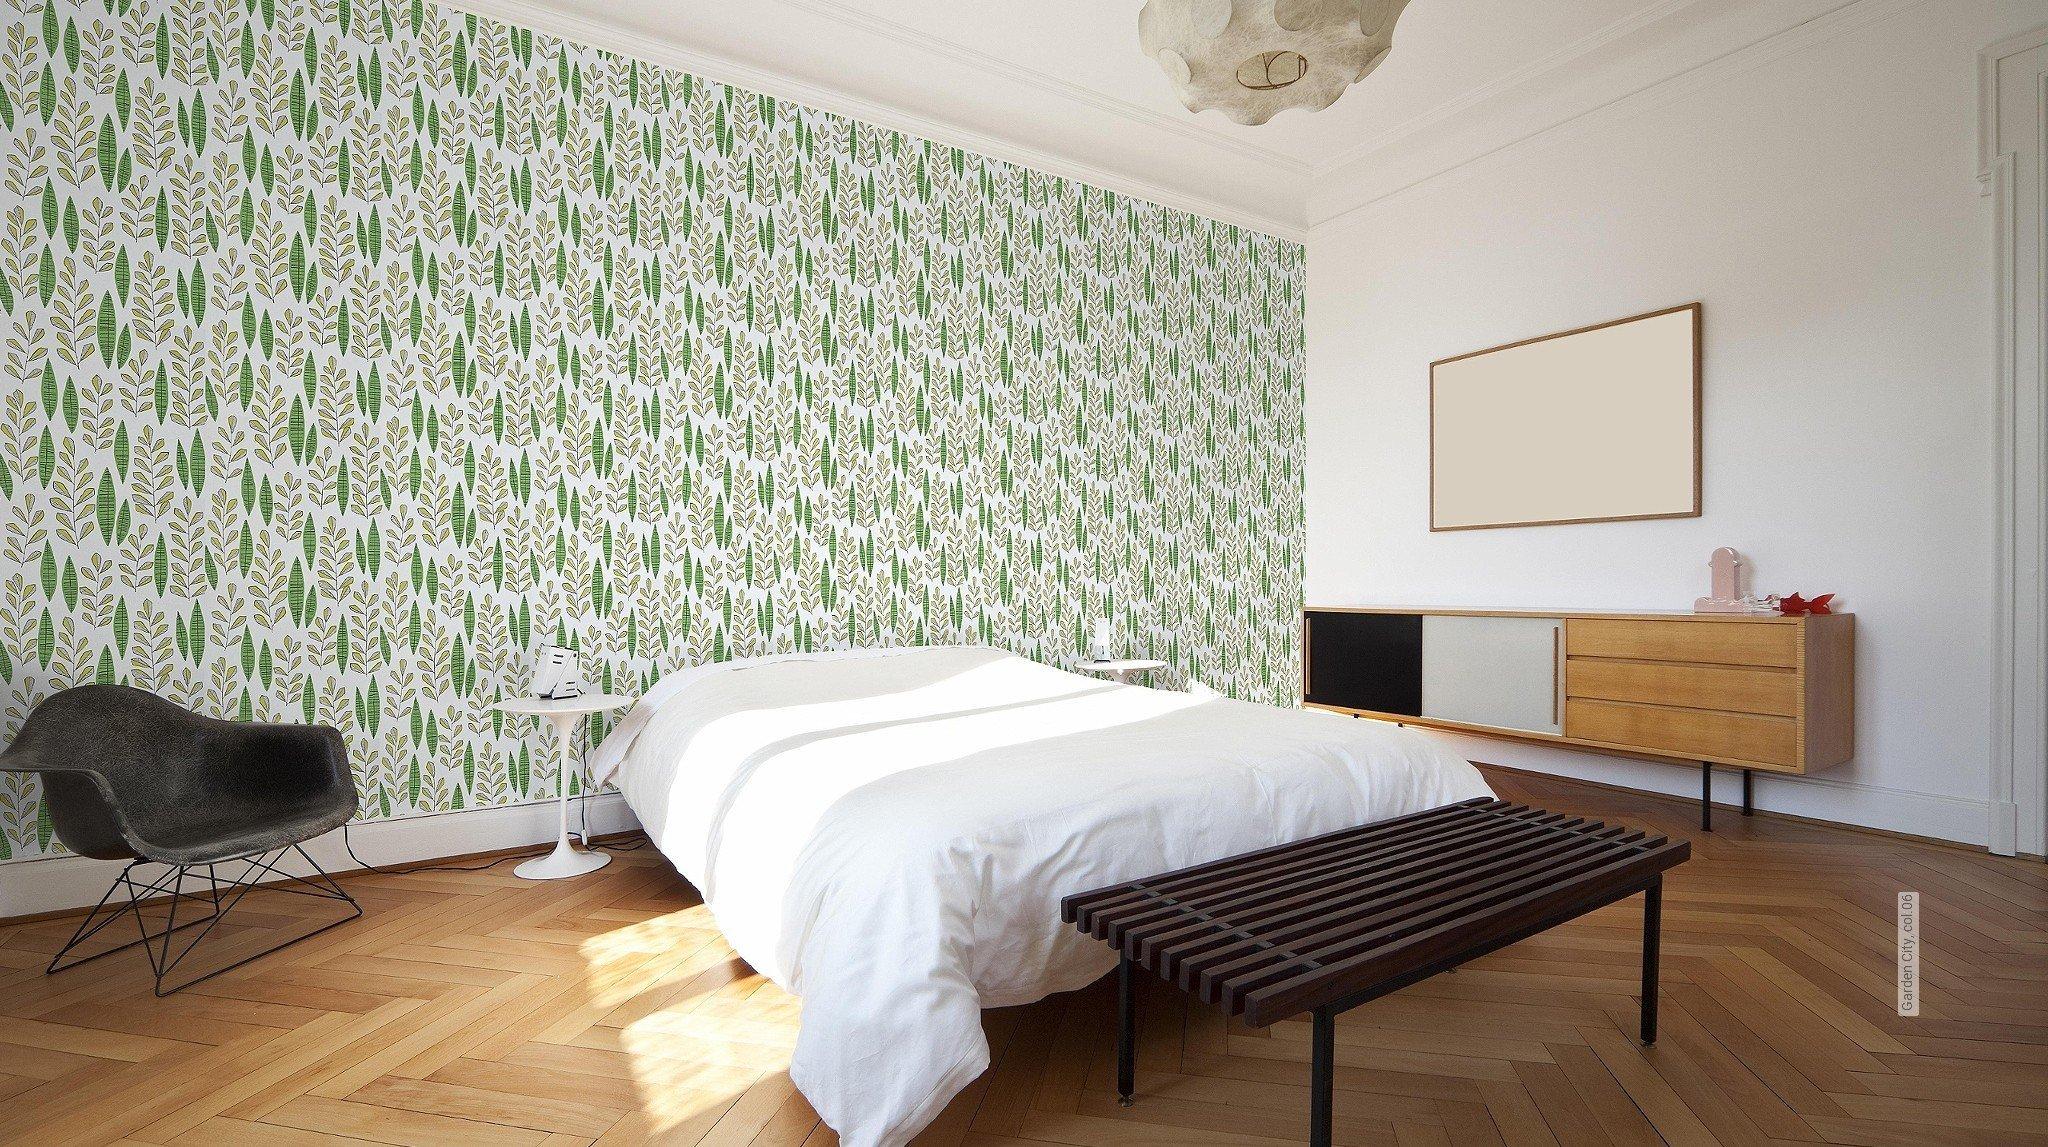 hellgr n gr n tapeten lust auf was neues. Black Bedroom Furniture Sets. Home Design Ideas